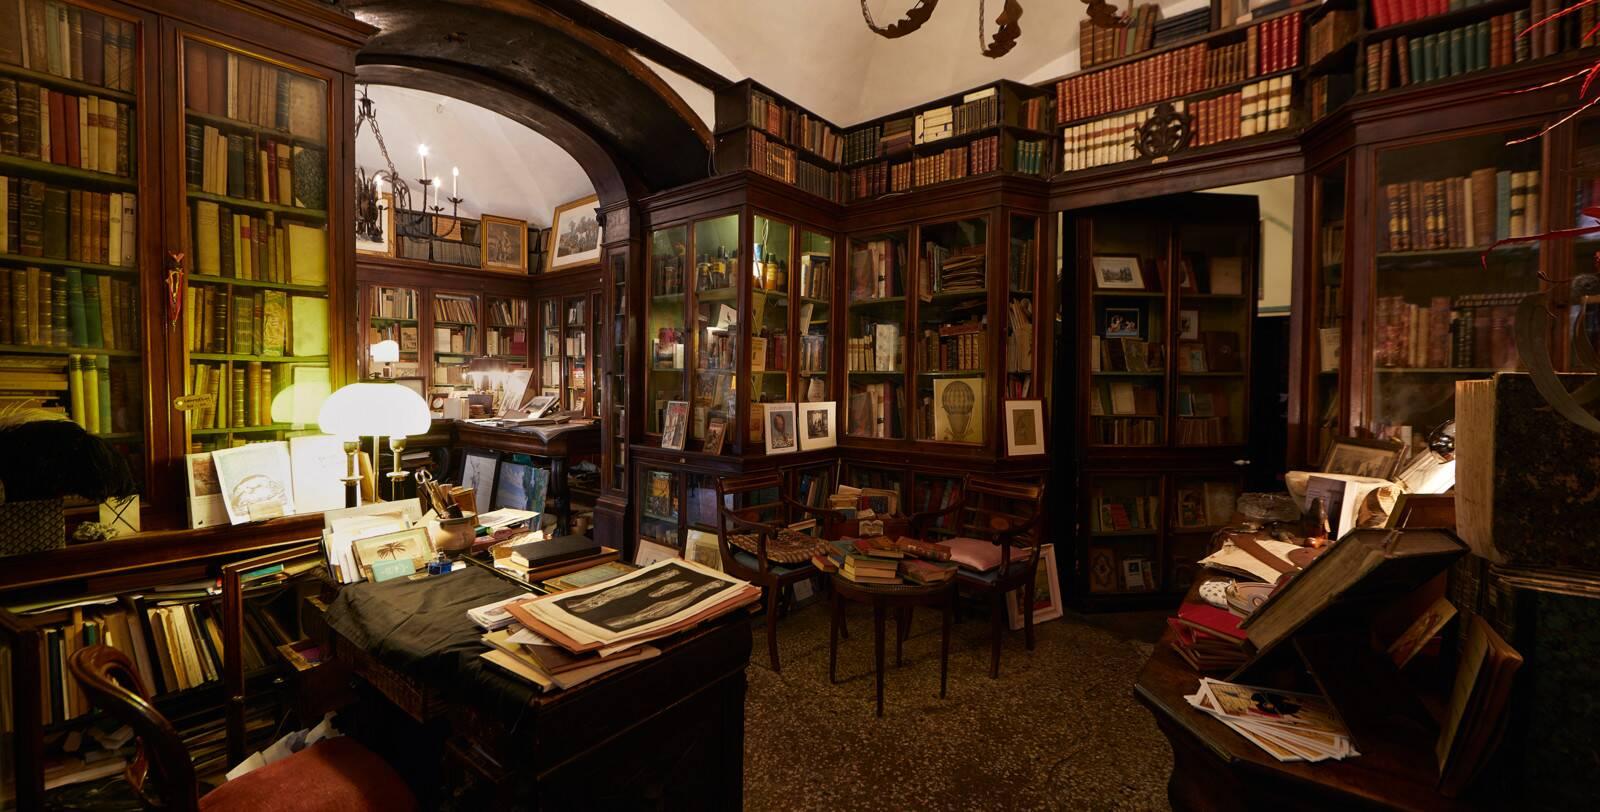 Librerie storiche a Roma